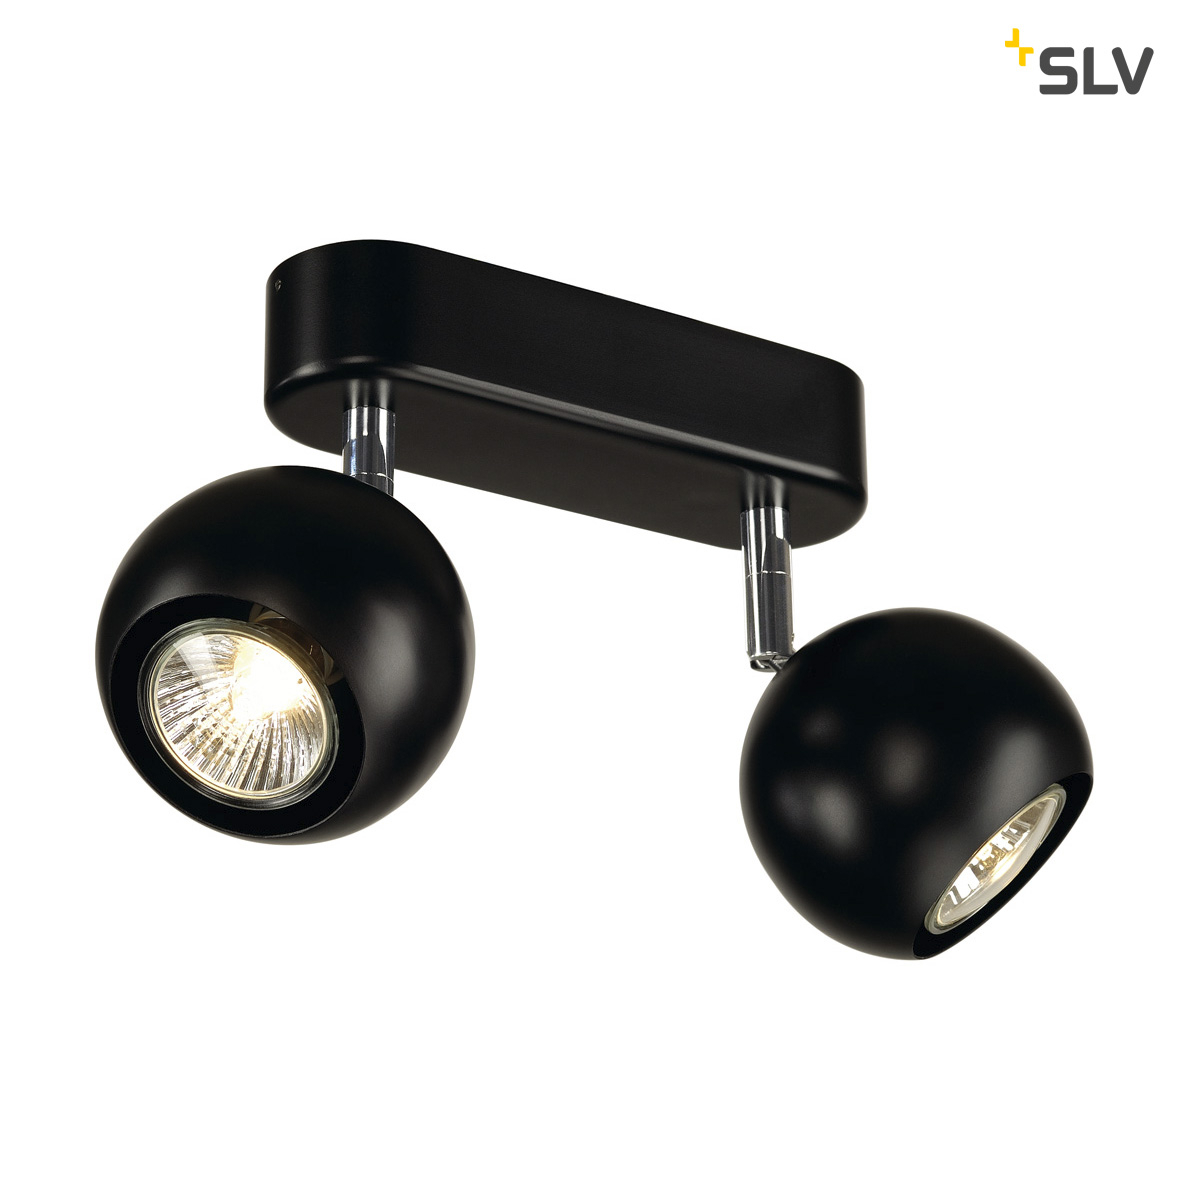 SLV - Light Eye 2 GU10